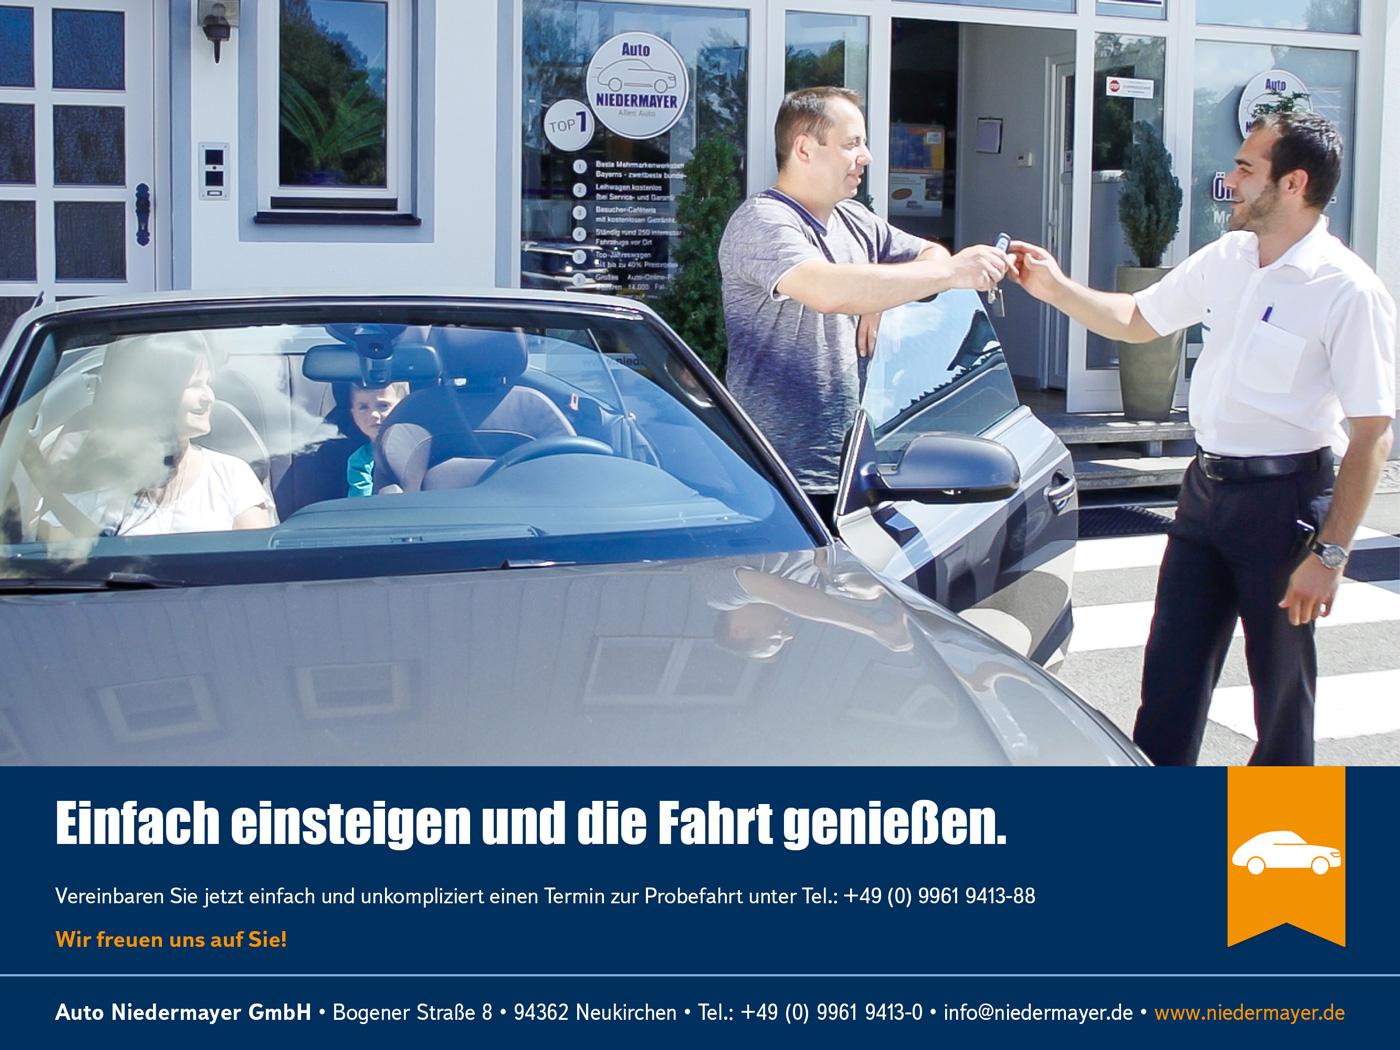 VOLKSWAGEN POLO 1.0 TSI Highline, Kamera. Bluetooth, Sitzheizung, Parkpilot, sof Auto Niedermayer B2B, D-94362 Neukirchen